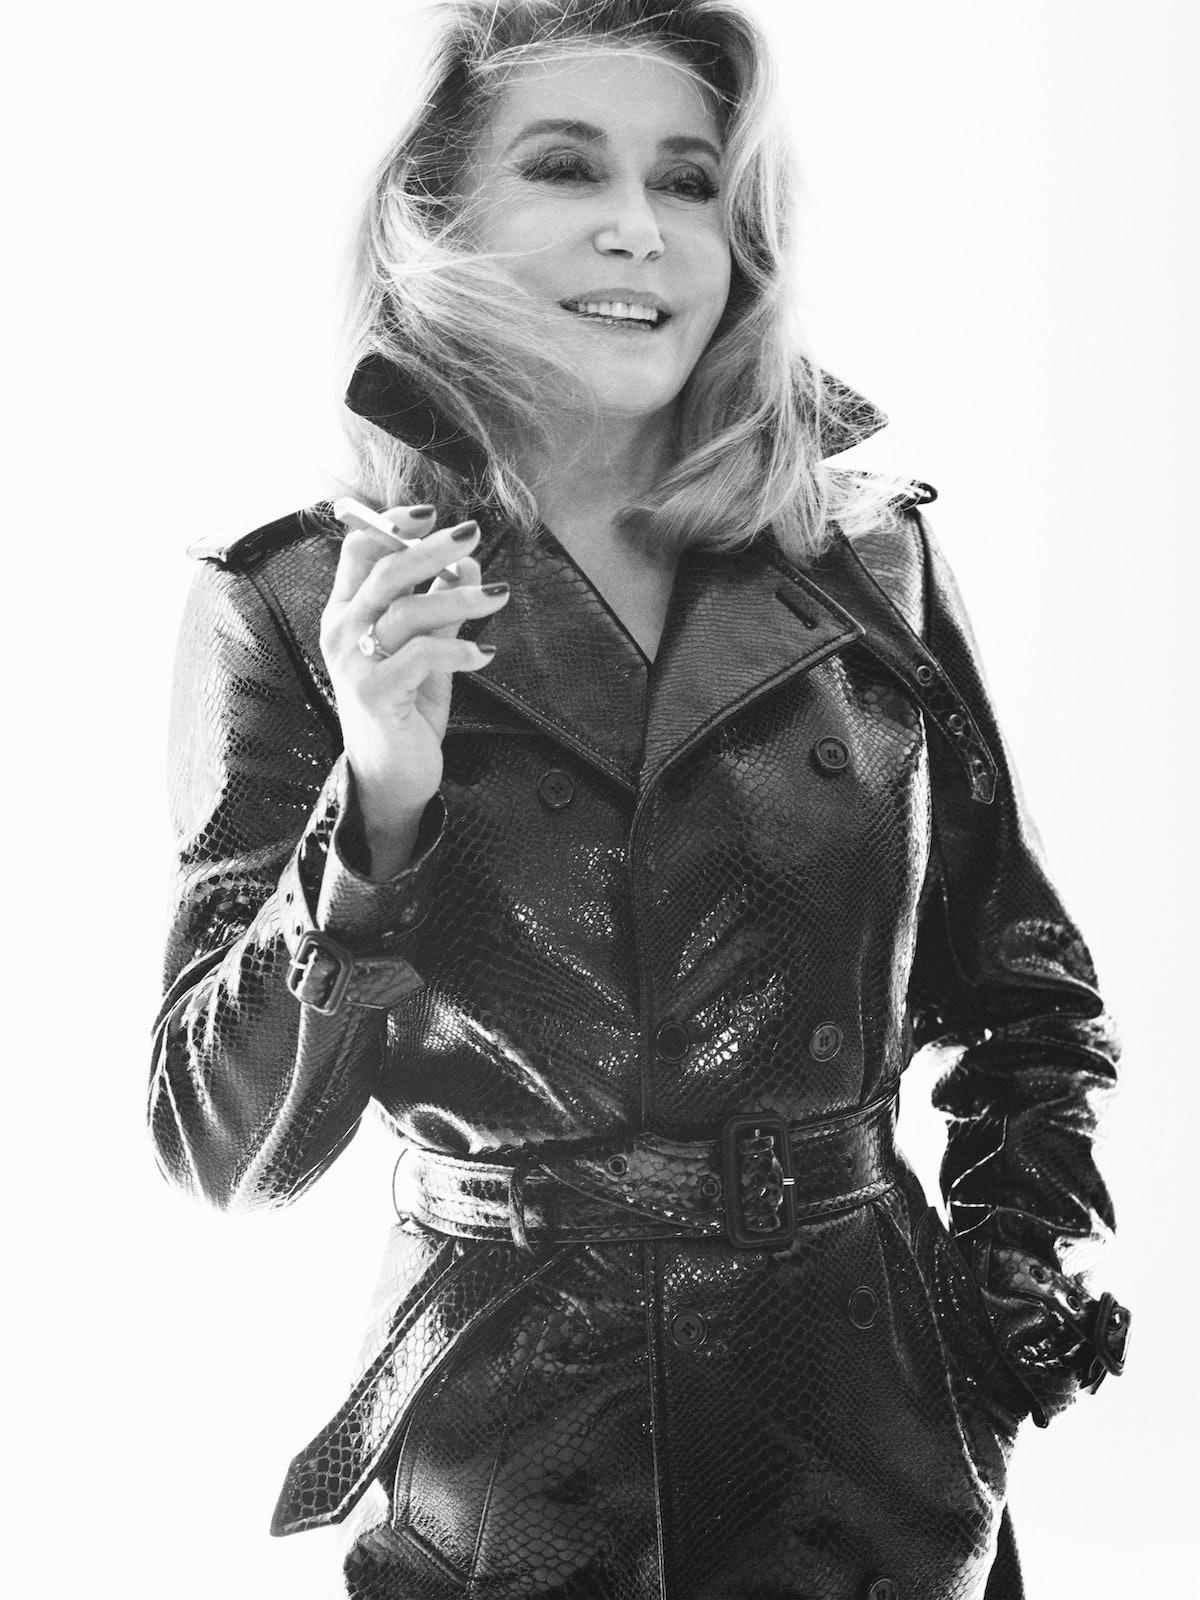 Catherine Deneuve smiling